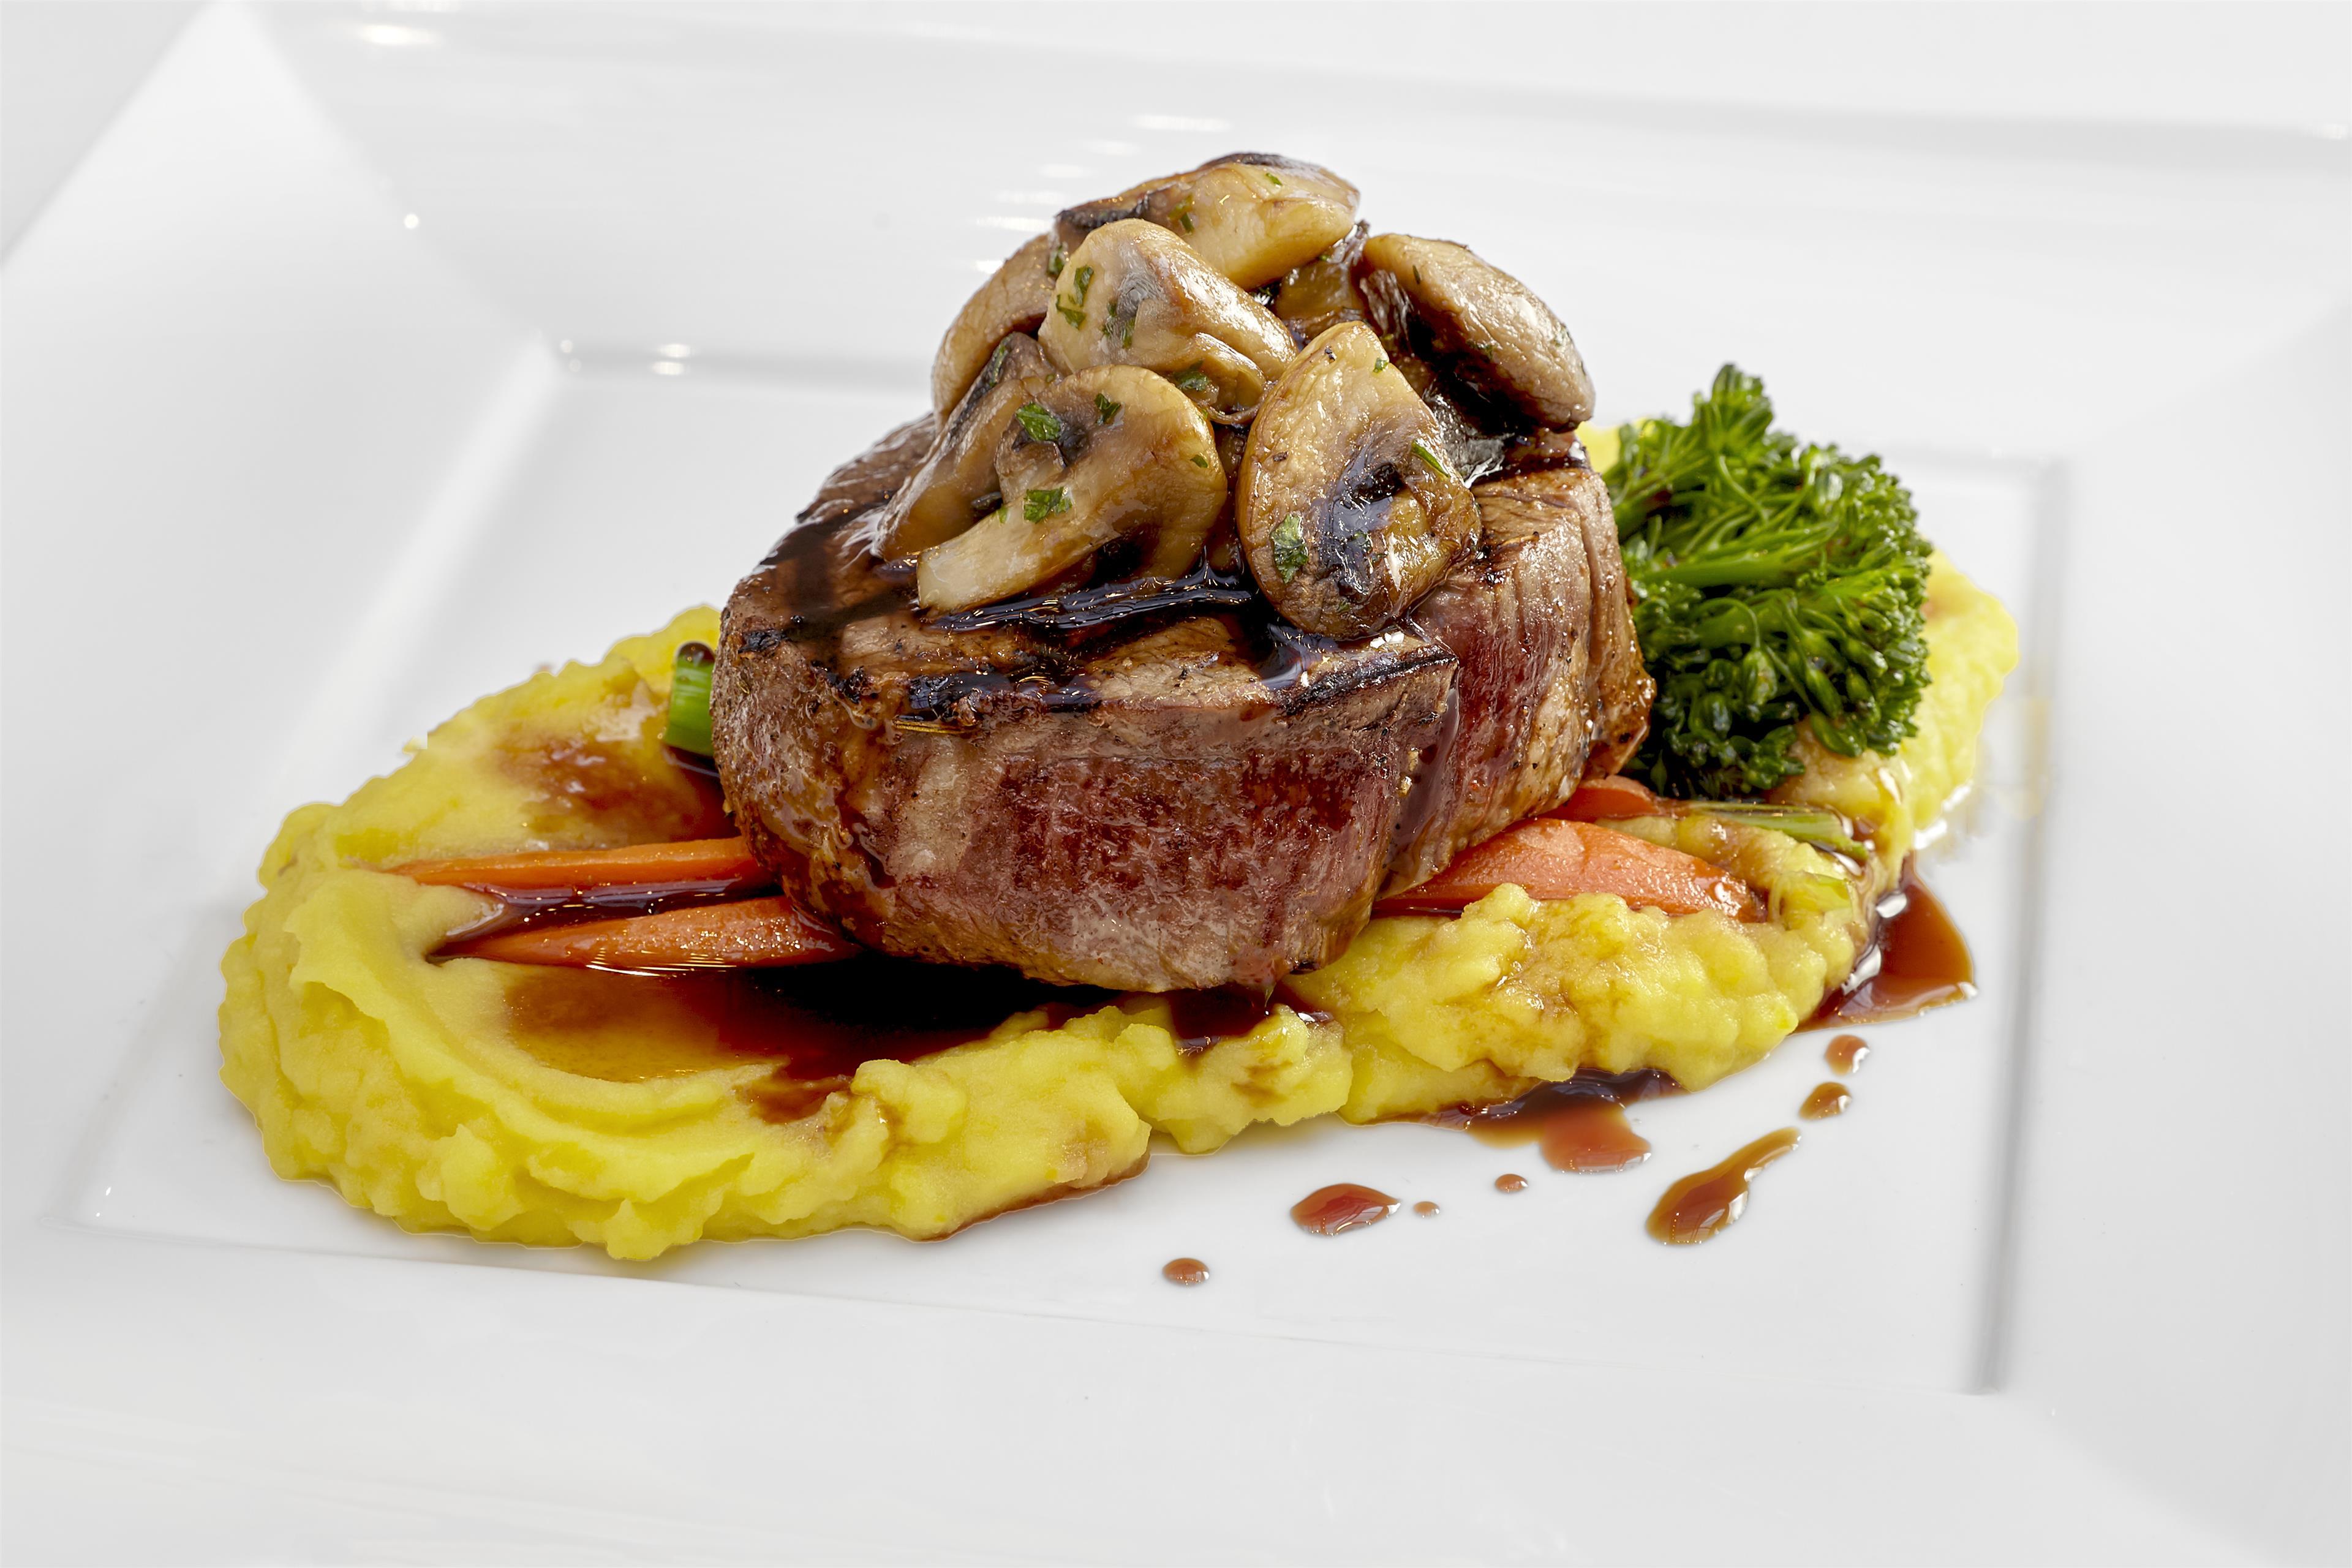 Sheraton Vancouver Guildford Hotel in Surrey: Dinner – 6 ounce Tenderloin